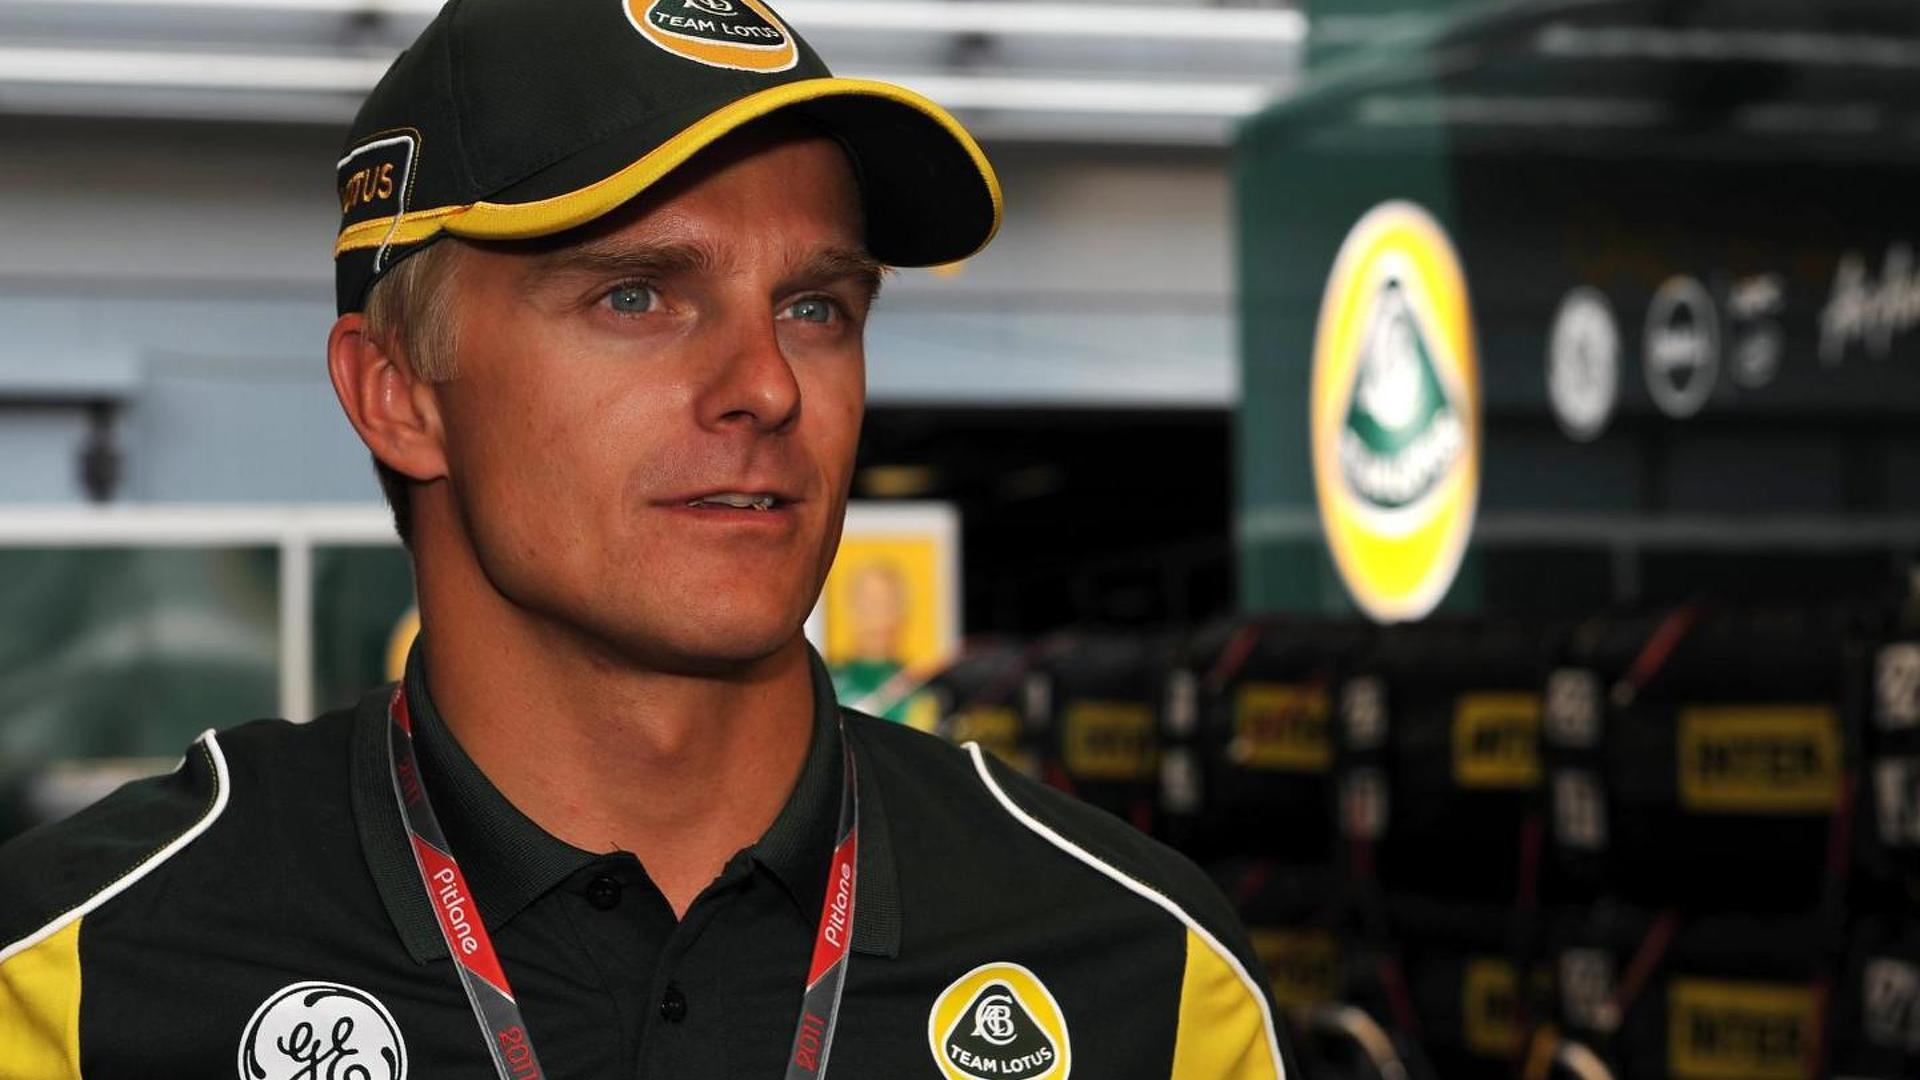 Lotus to announce Kovalainen as Raikkonen replacement